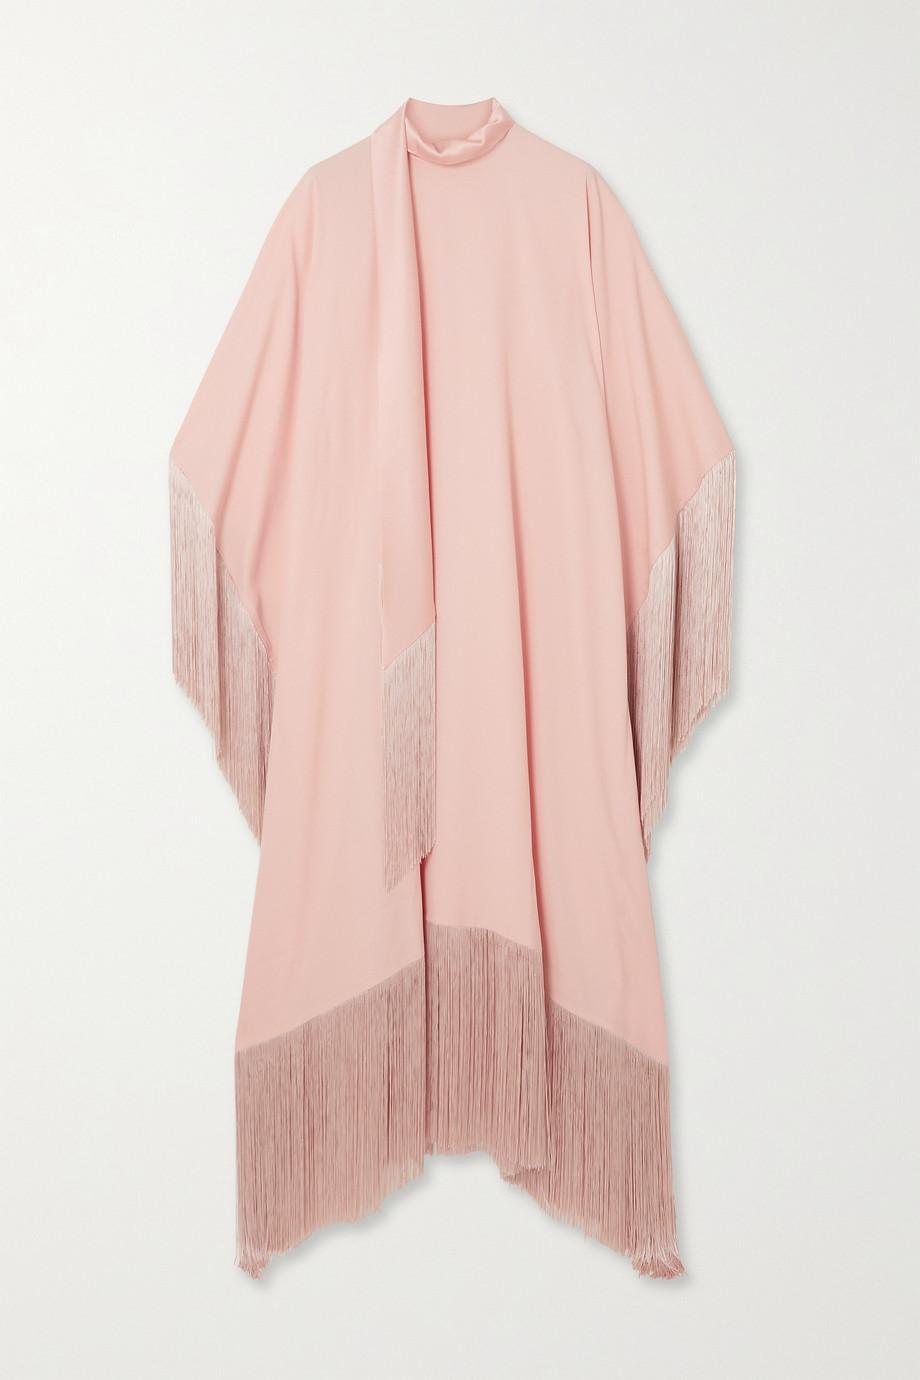 Taller Marmo Mrs Ross tie-detailed fringed crepe kaftan